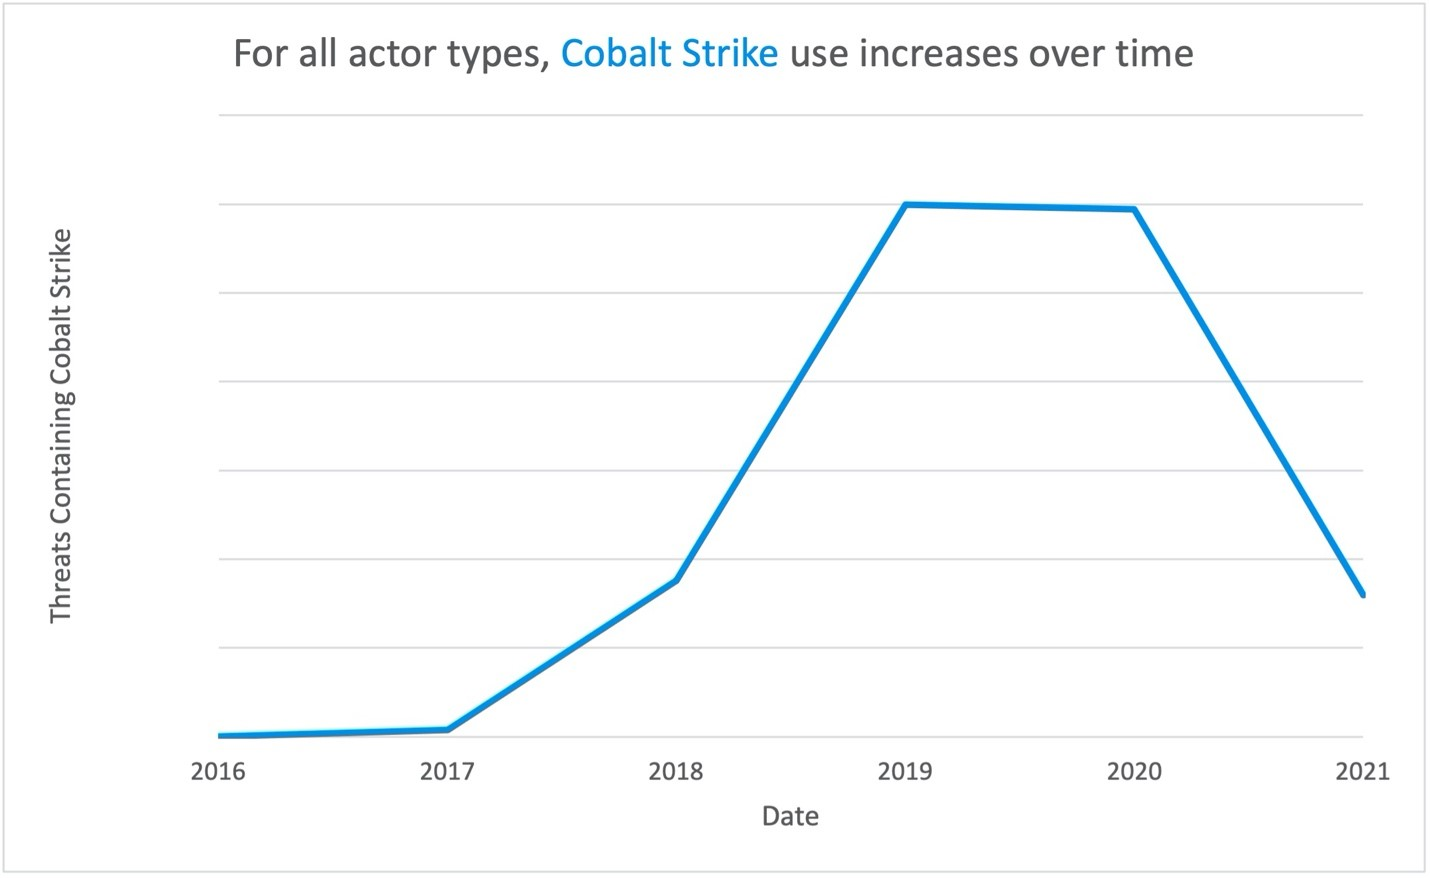 Cobalt Strike